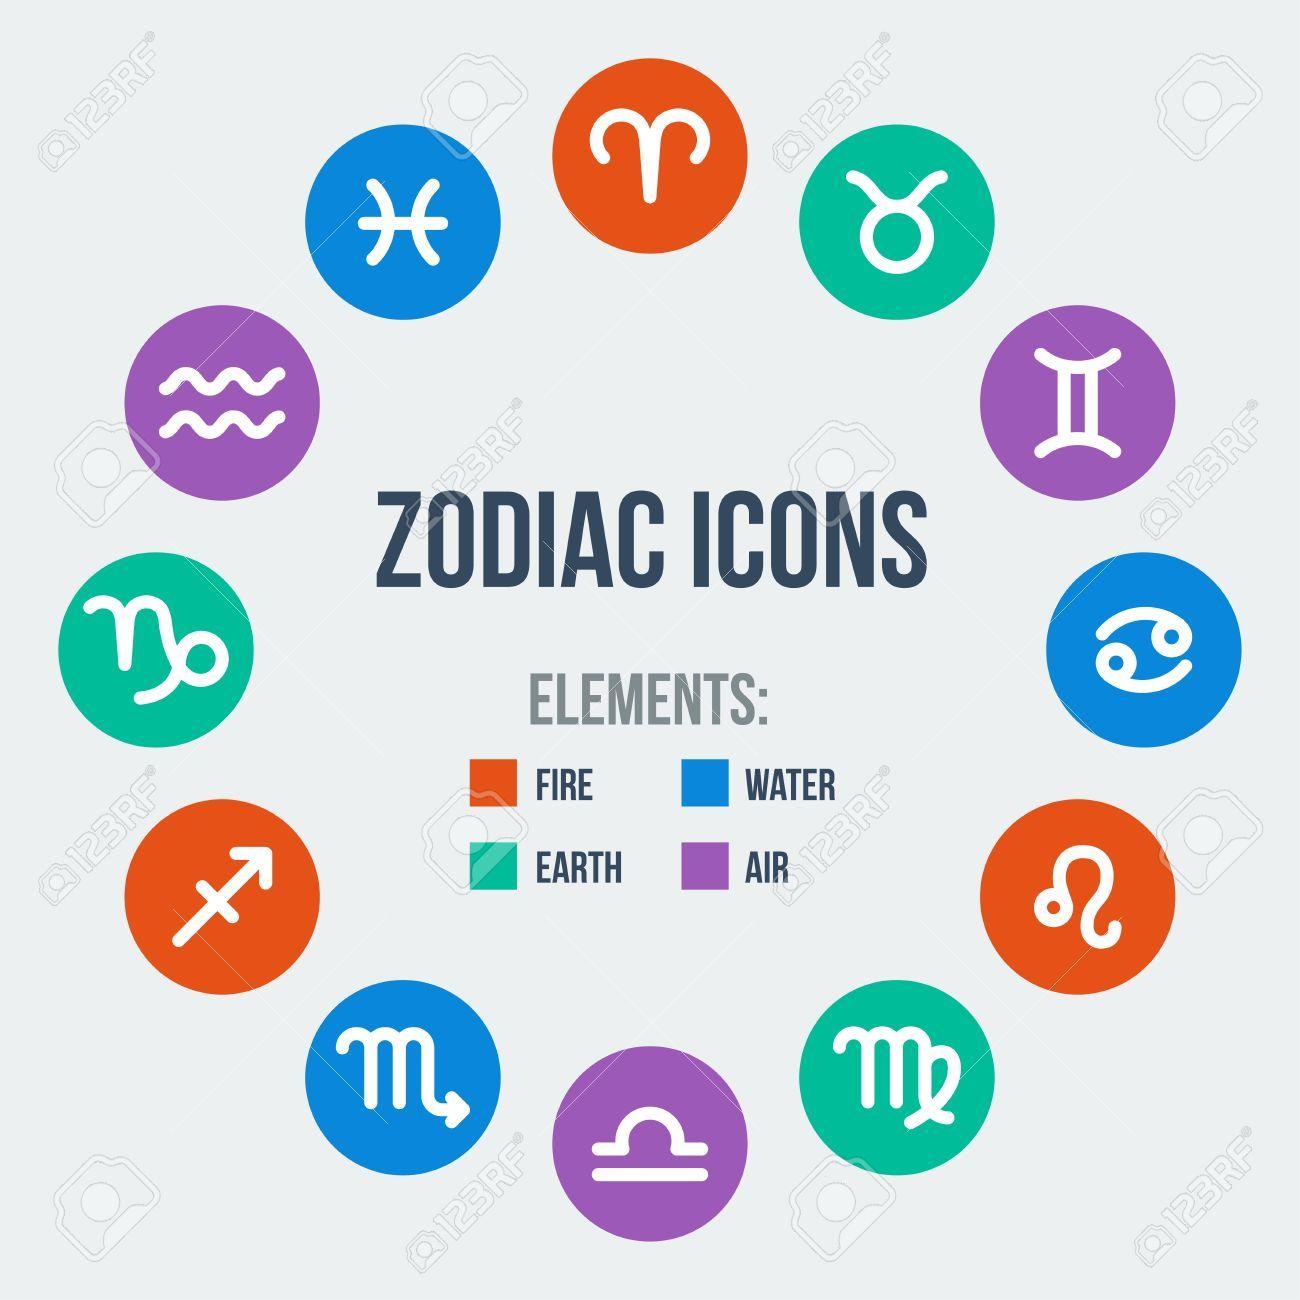 water signs zodiac Google Search Imagens vetoriais